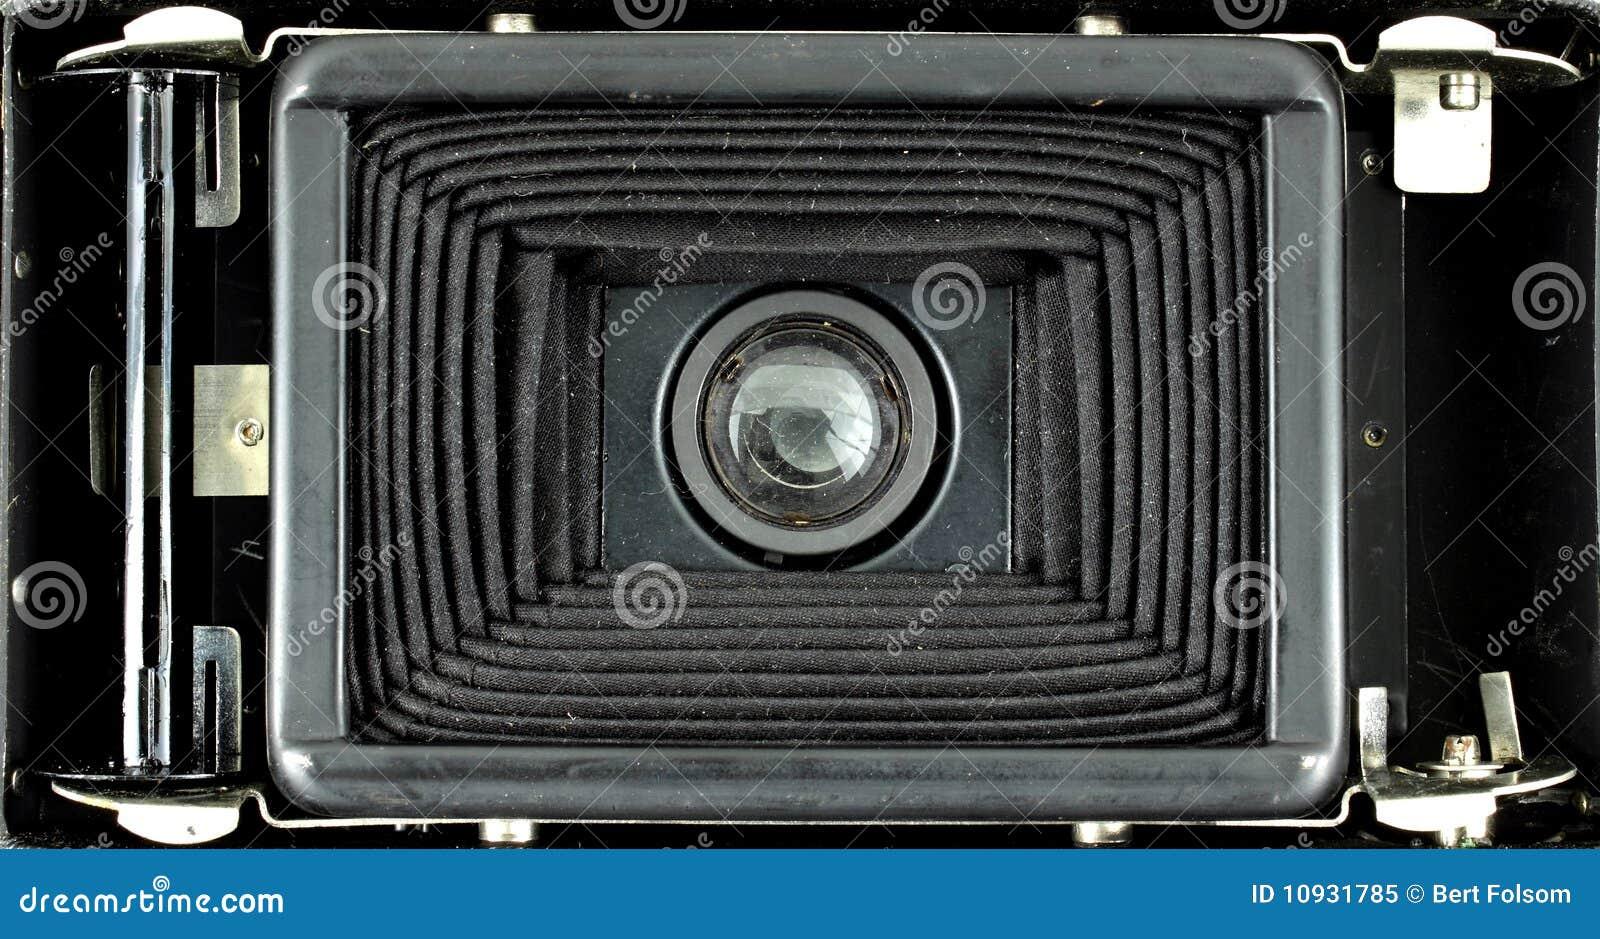 рявкает средство формы пленки камеры складывая